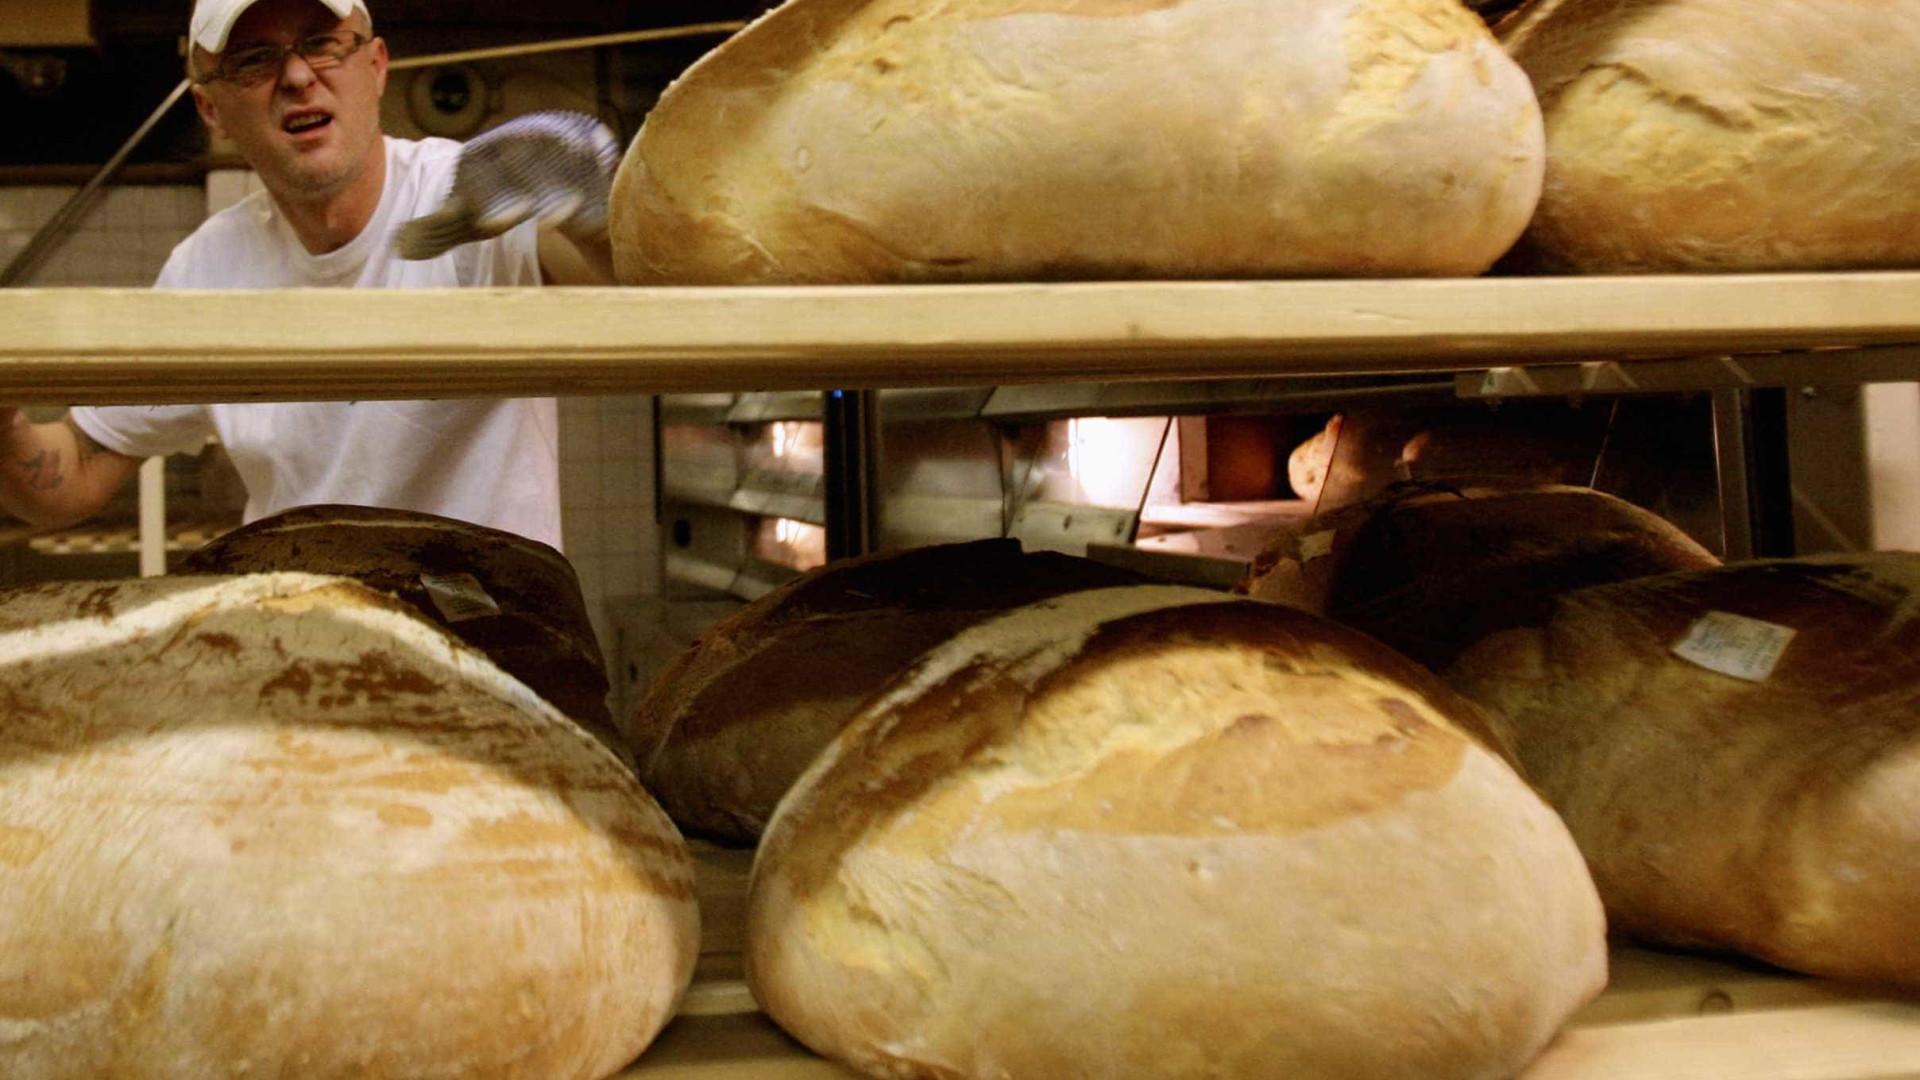 Venezuela: Bens alimentares roubados de padaria de portugueses